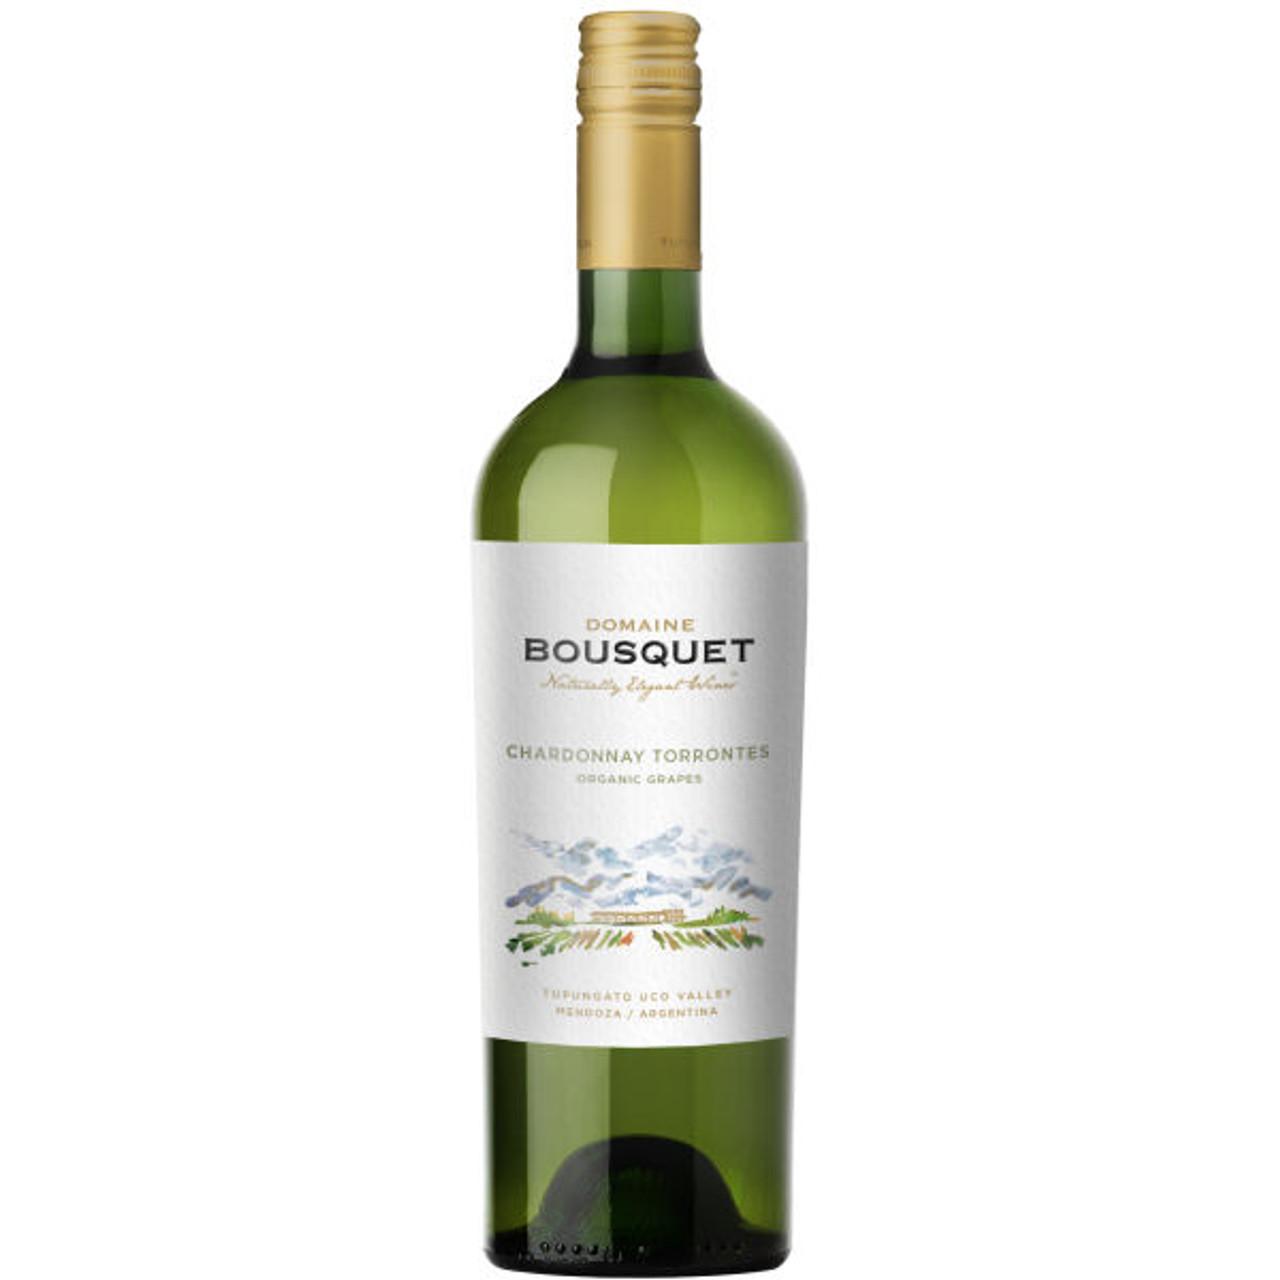 Domaine Bousquet Premium Organic Chardonnay Torrontes